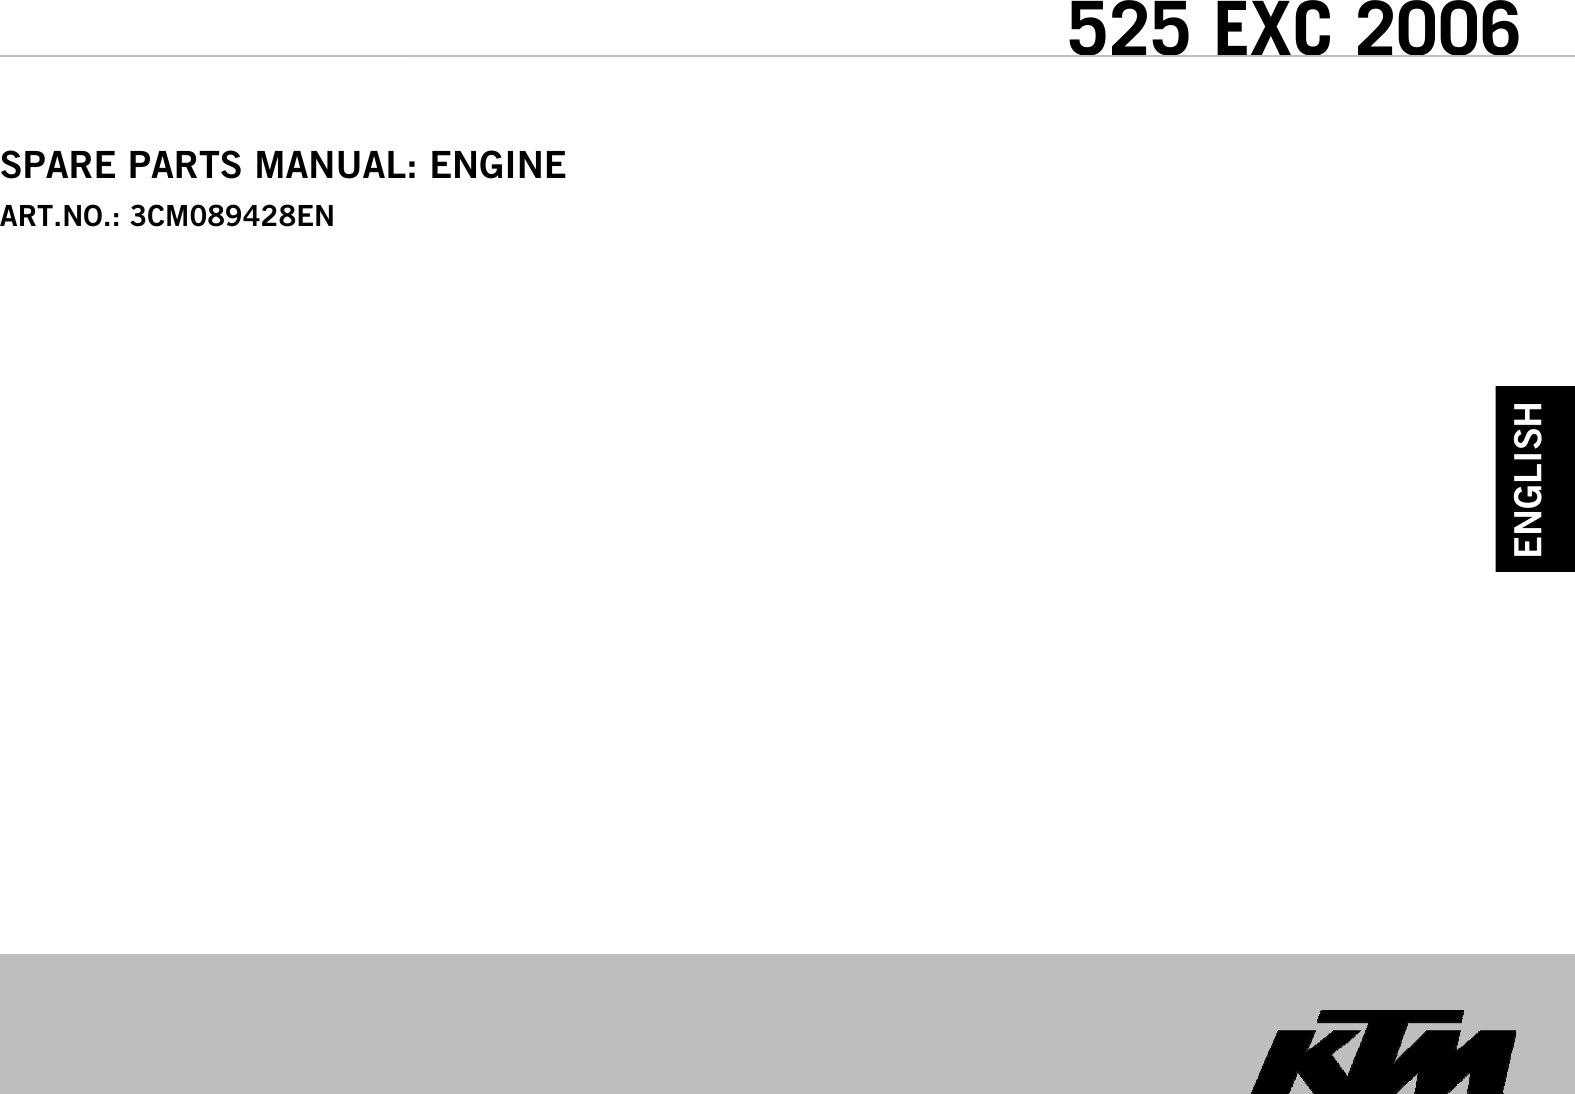 Ktm 525 Exc 2006 Users Manual 3cm089428en Motor 4t 2006xml Fuse Box